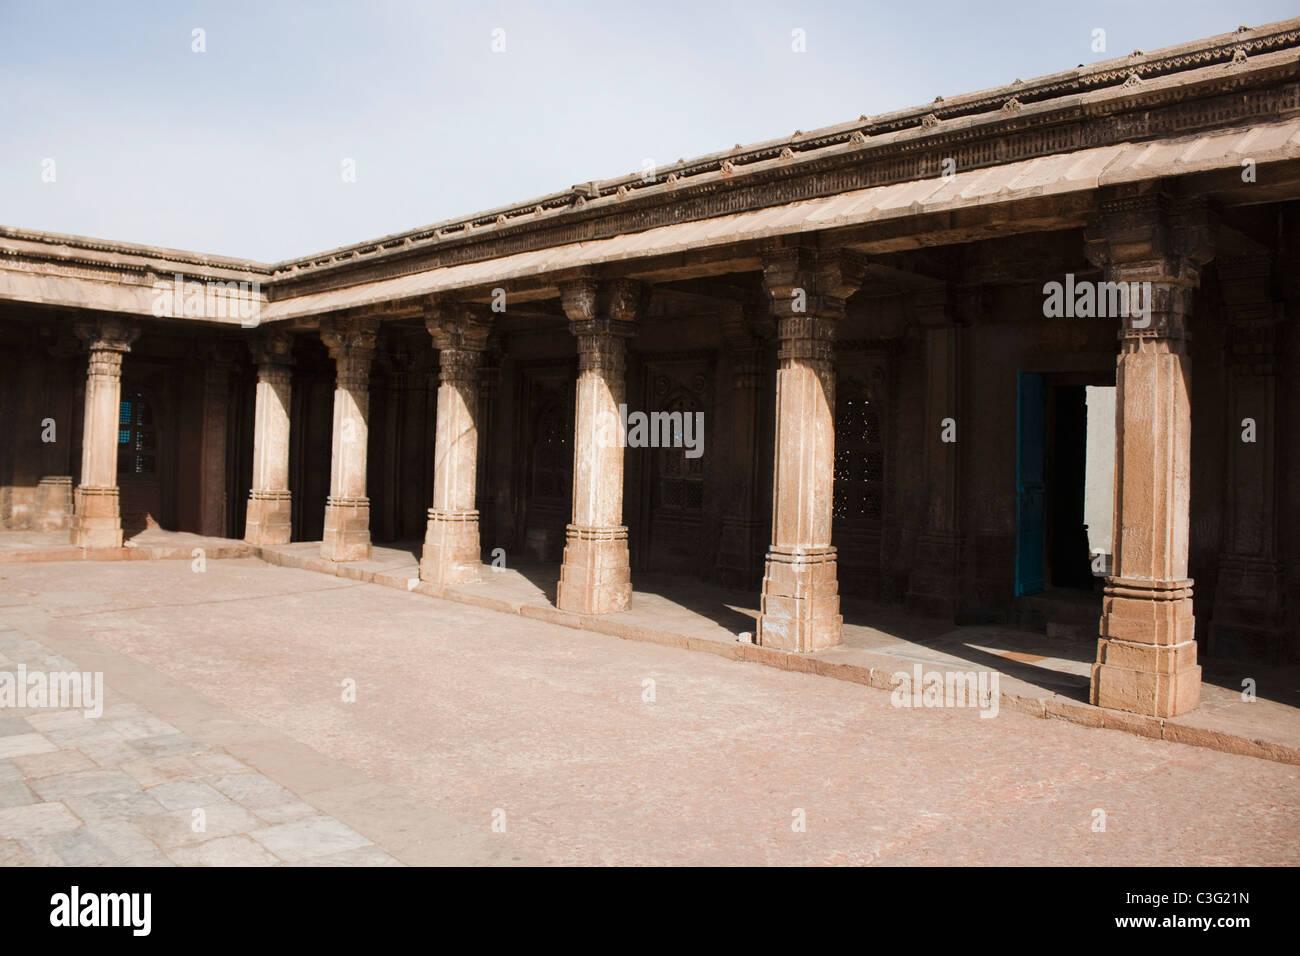 Courtyard of a building, Ahemdabad, Gujarat, India - Stock Image